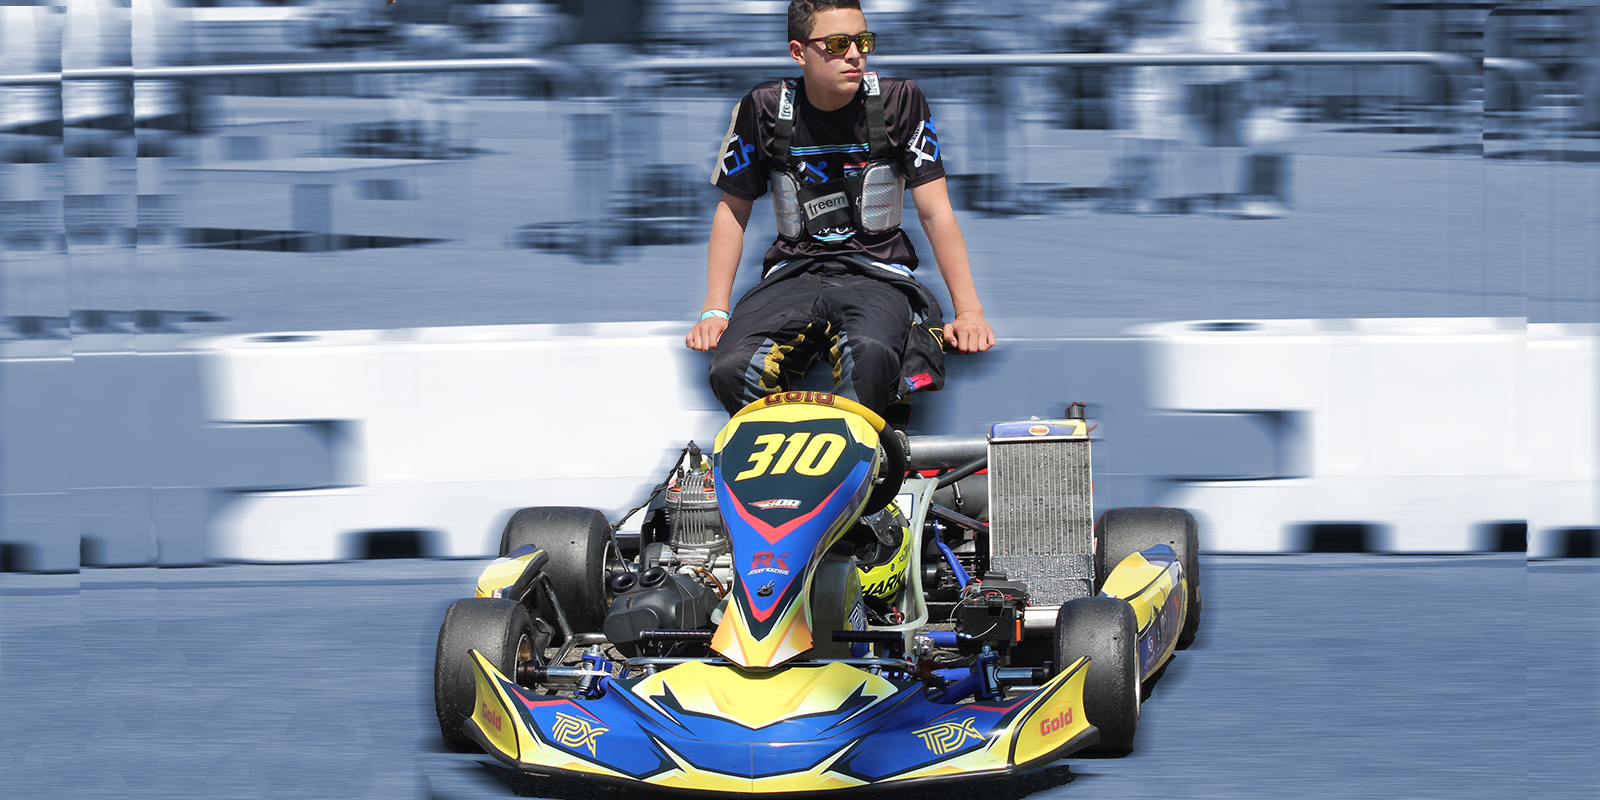 Race 2: Emmen (NL) 27/28-05-2017